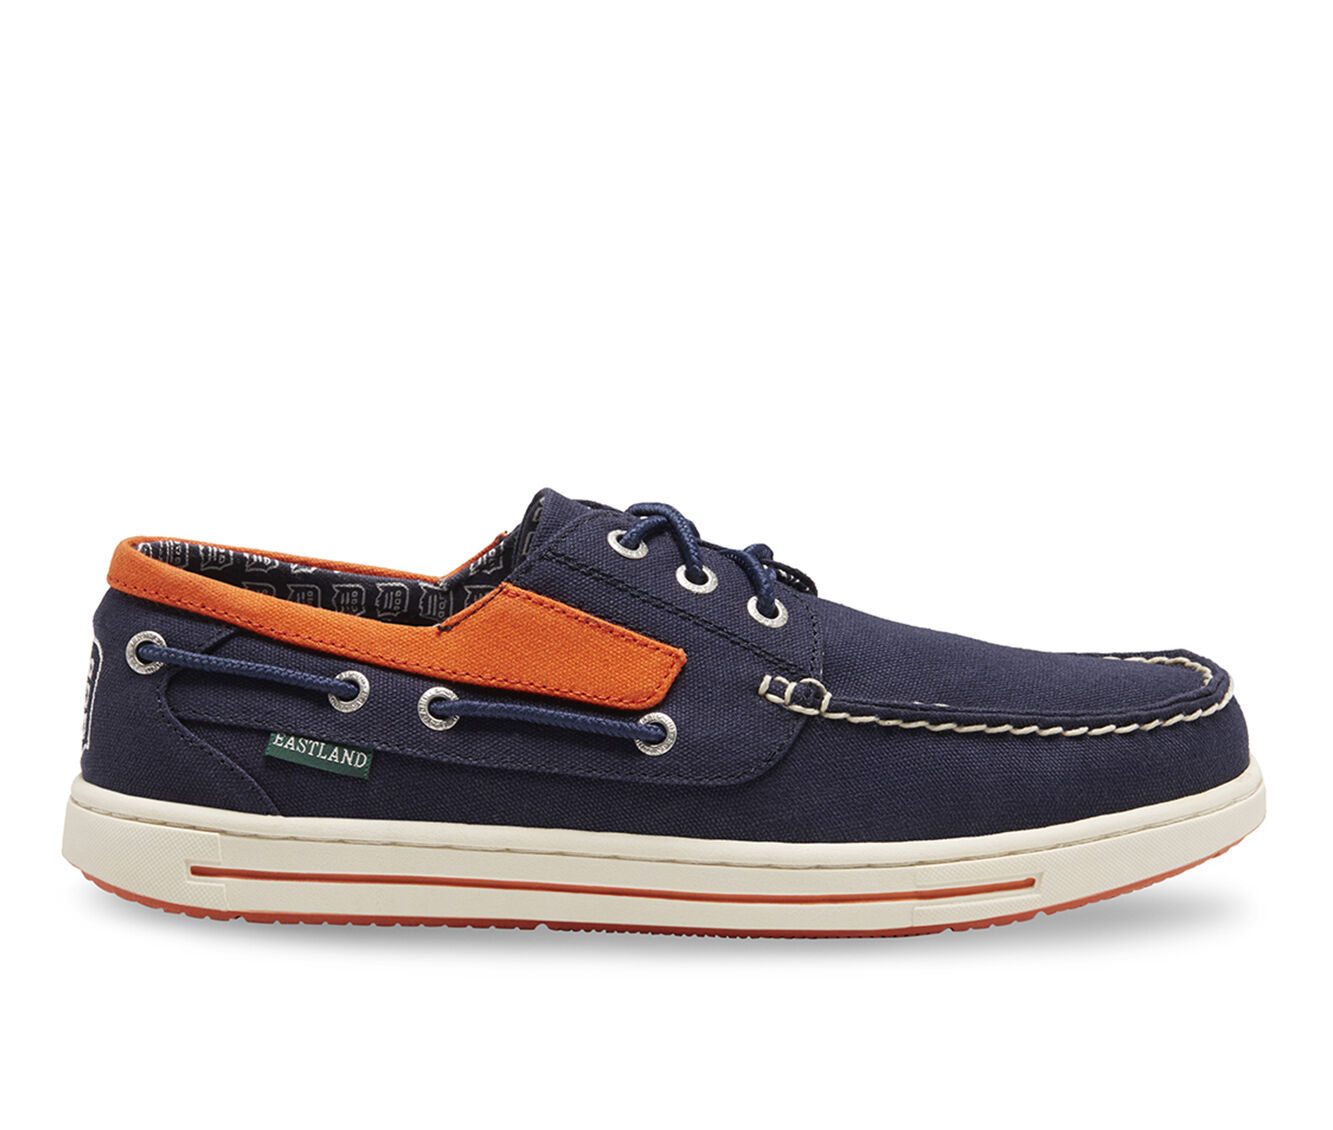 Men's Eastland Adventure MLB Tigers Boat Shoes Blue